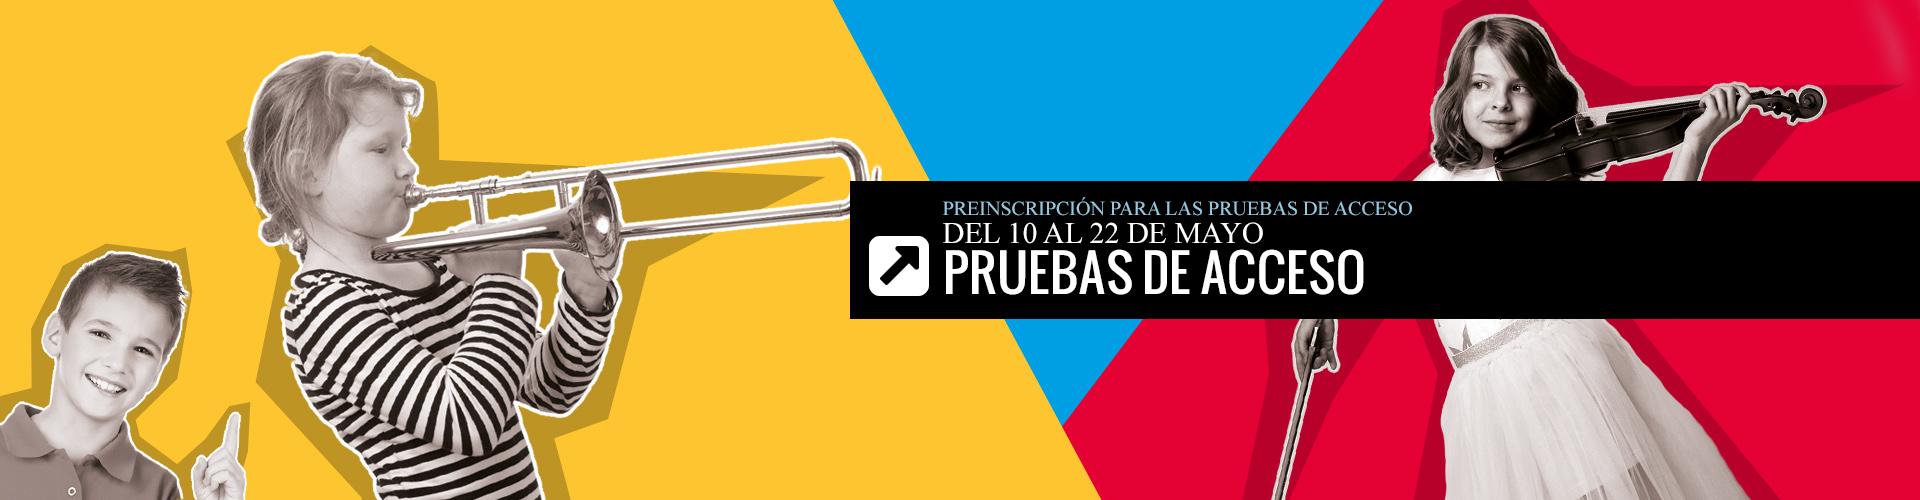 heading-pruebas